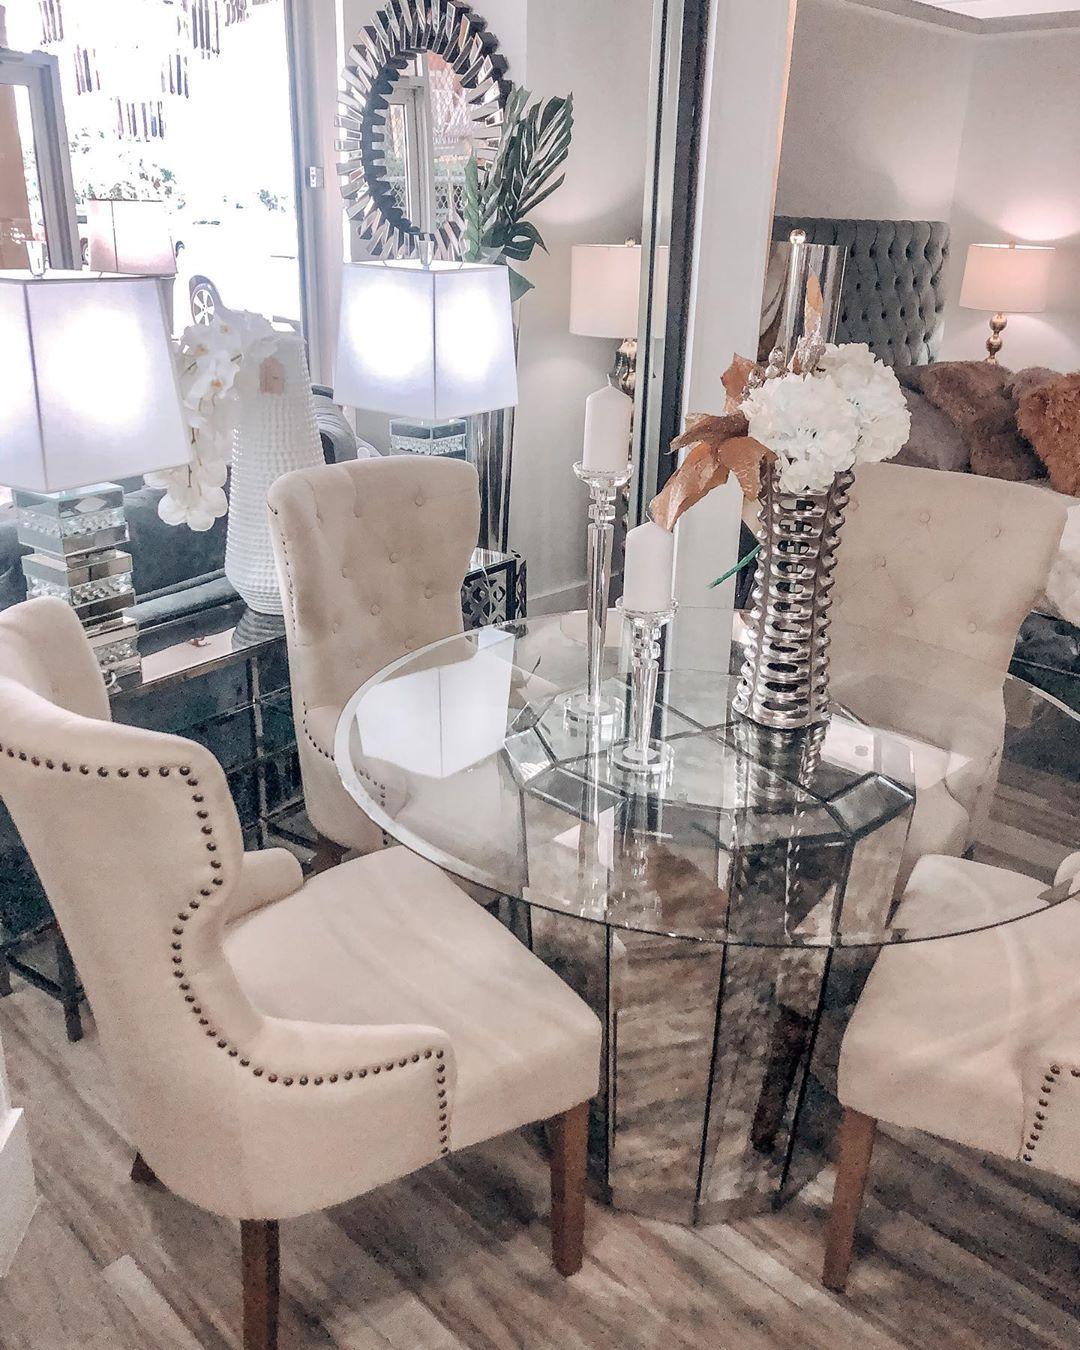 "Coco Furniture Gallery on Instagram: ""Act now! Just one set left for $949😍 -  #realtor #realestatemiami #love #midtownmiami #interiordesign #southflorida #westpalmbeach #boynton…"""